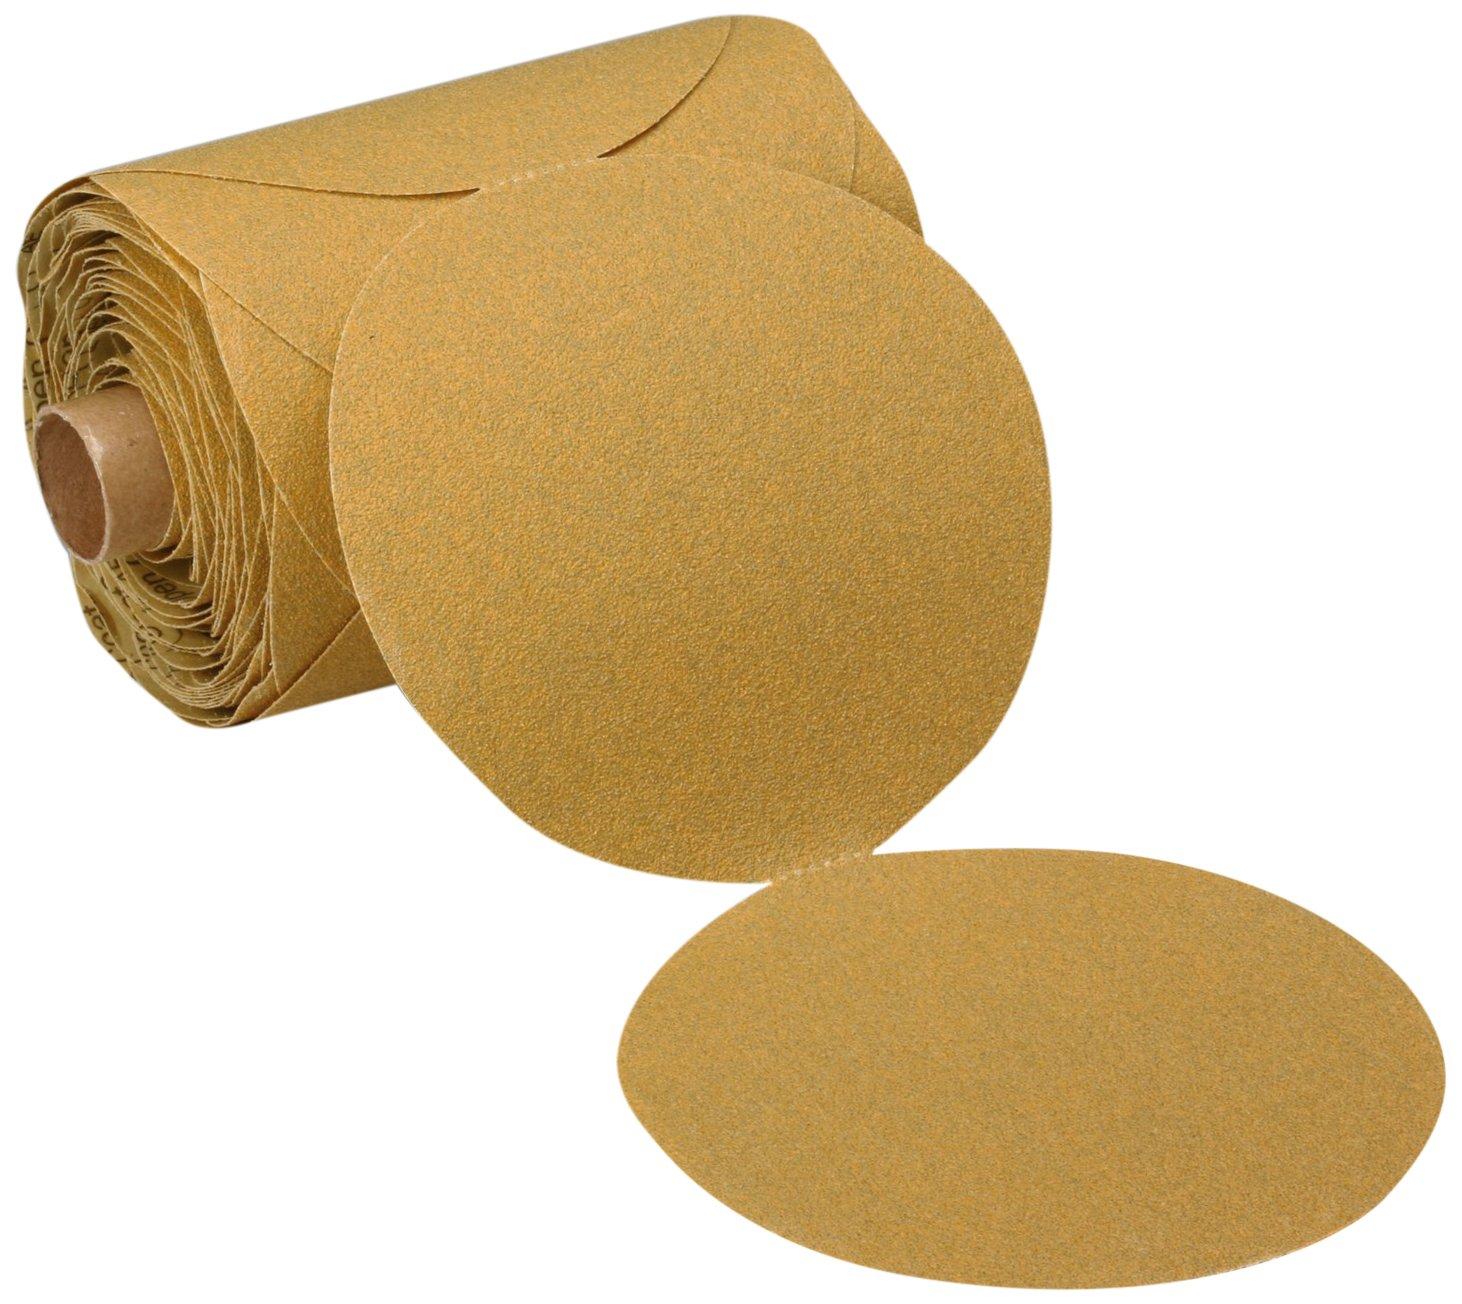 3M Stikit Paper Disc Roll 363I, PSA Attachment, Aluminum Oxide, 5'' Diameter, 80 Grit (Roll of 100) by Cubitron